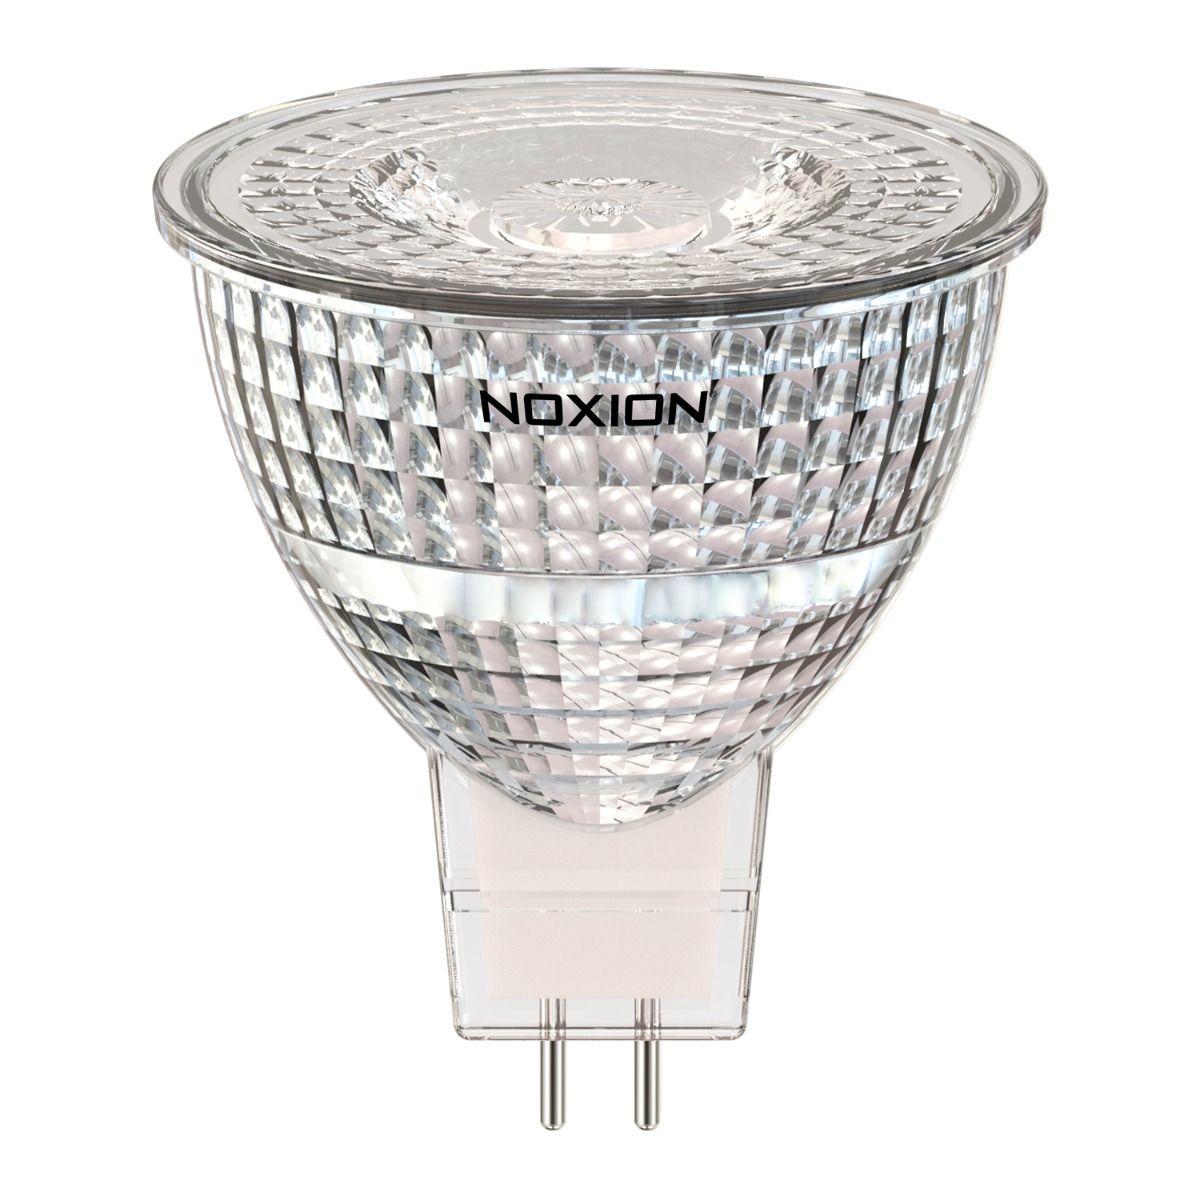 Noxion LED Spot GU5.3 7.8W 840 36D 730lm | Vervanger voor 50W